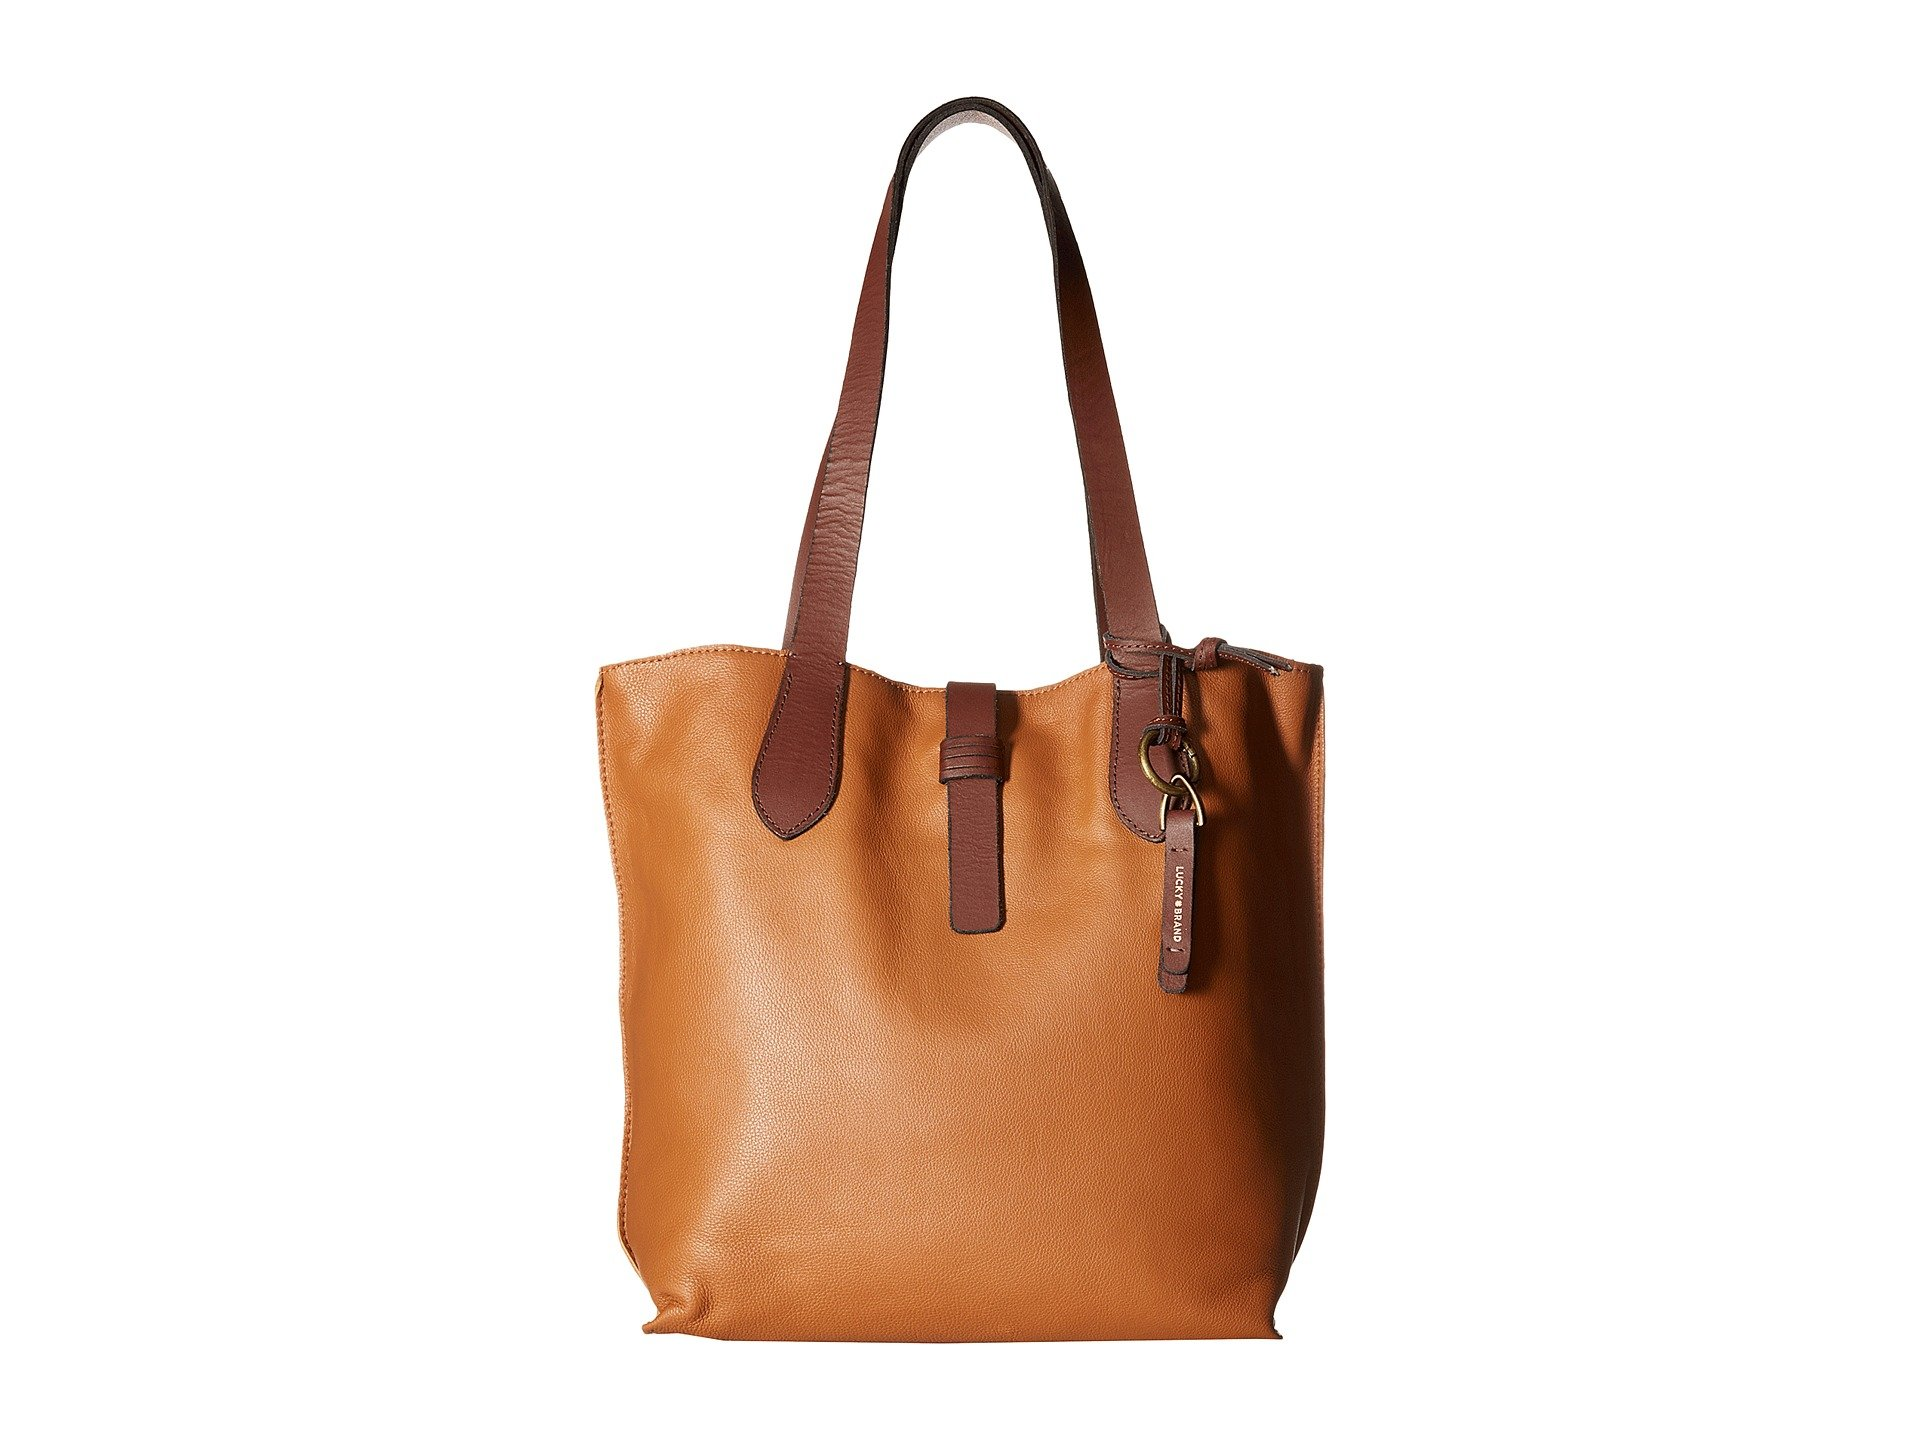 Lucky Brand Women's Sheldon Tote Tobacco/Brandy Handbag